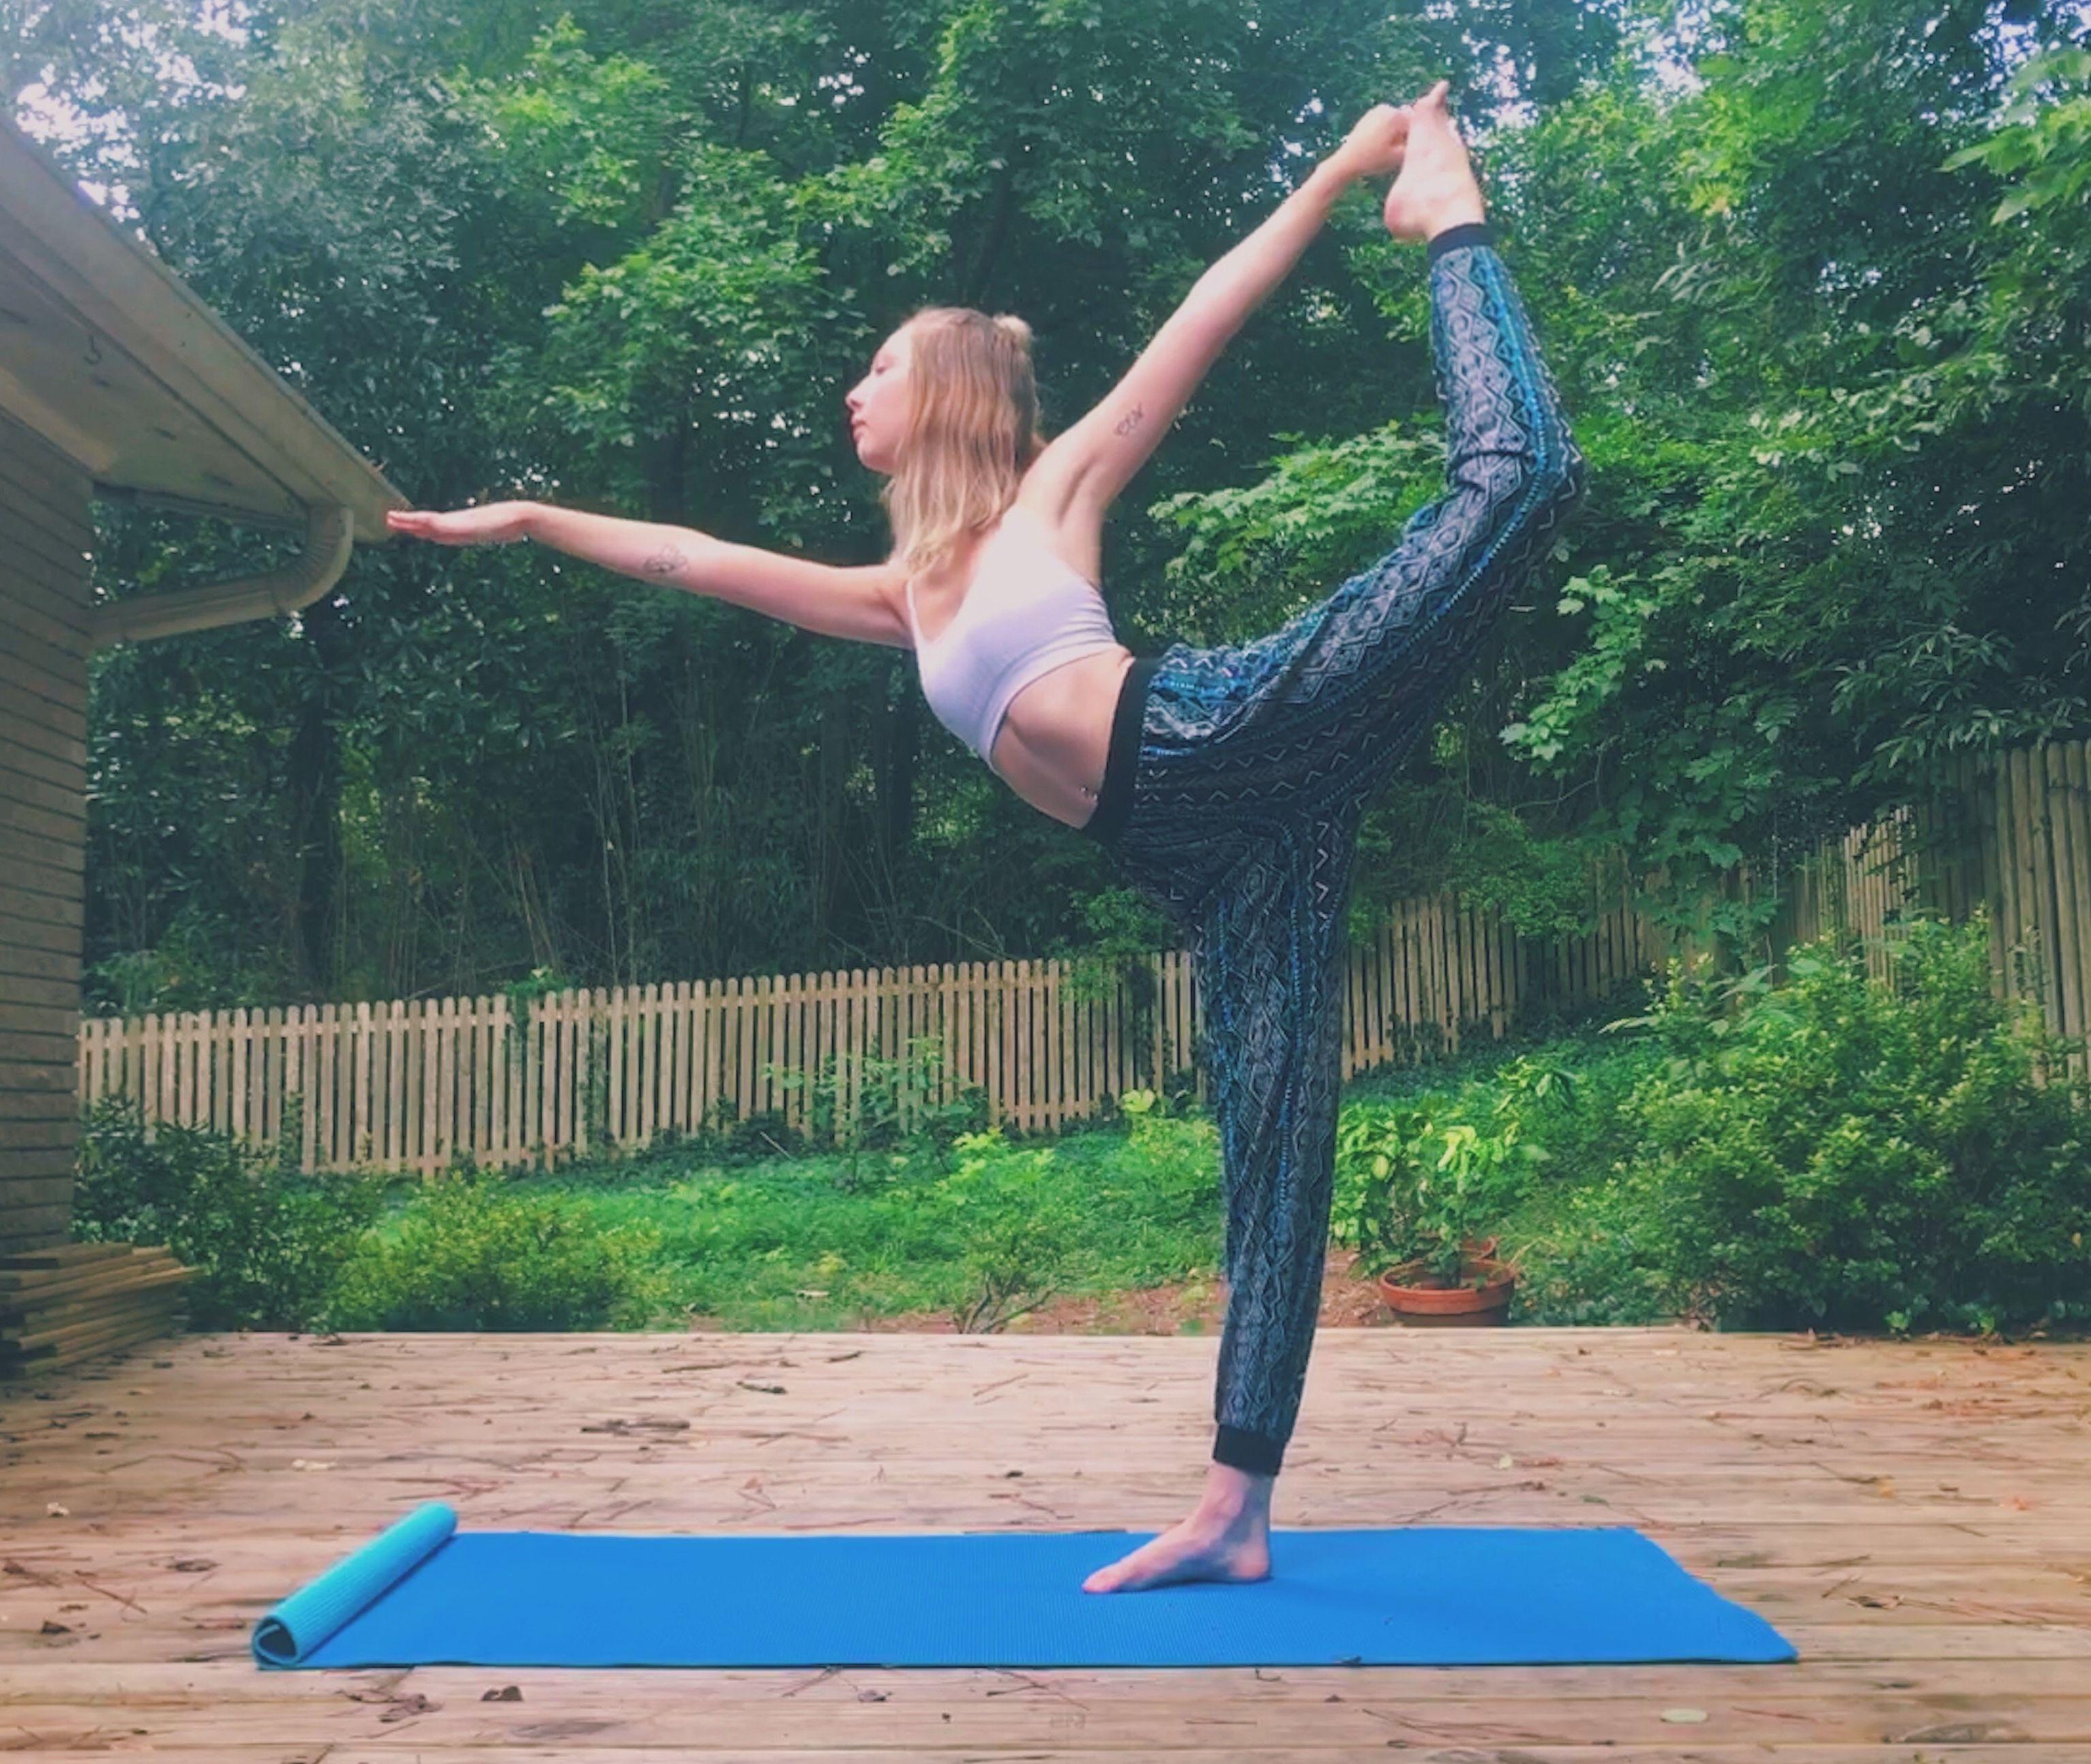 8 Surprising Benefits of Practicing Yoga